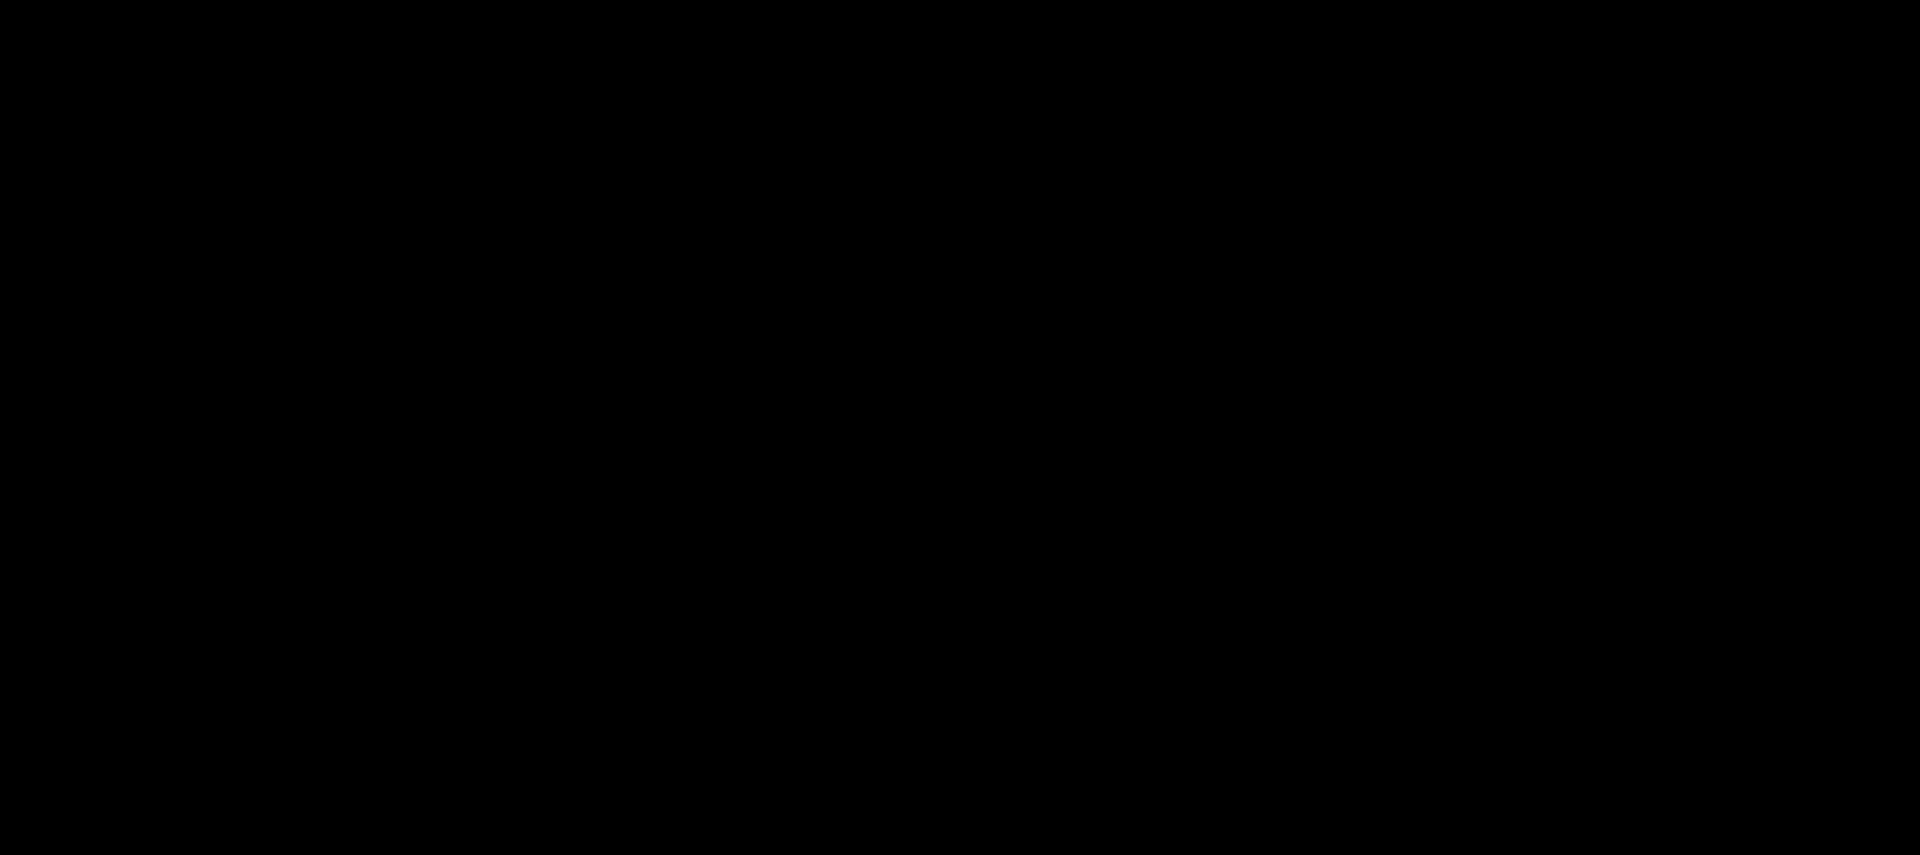 startup-1993900_1920